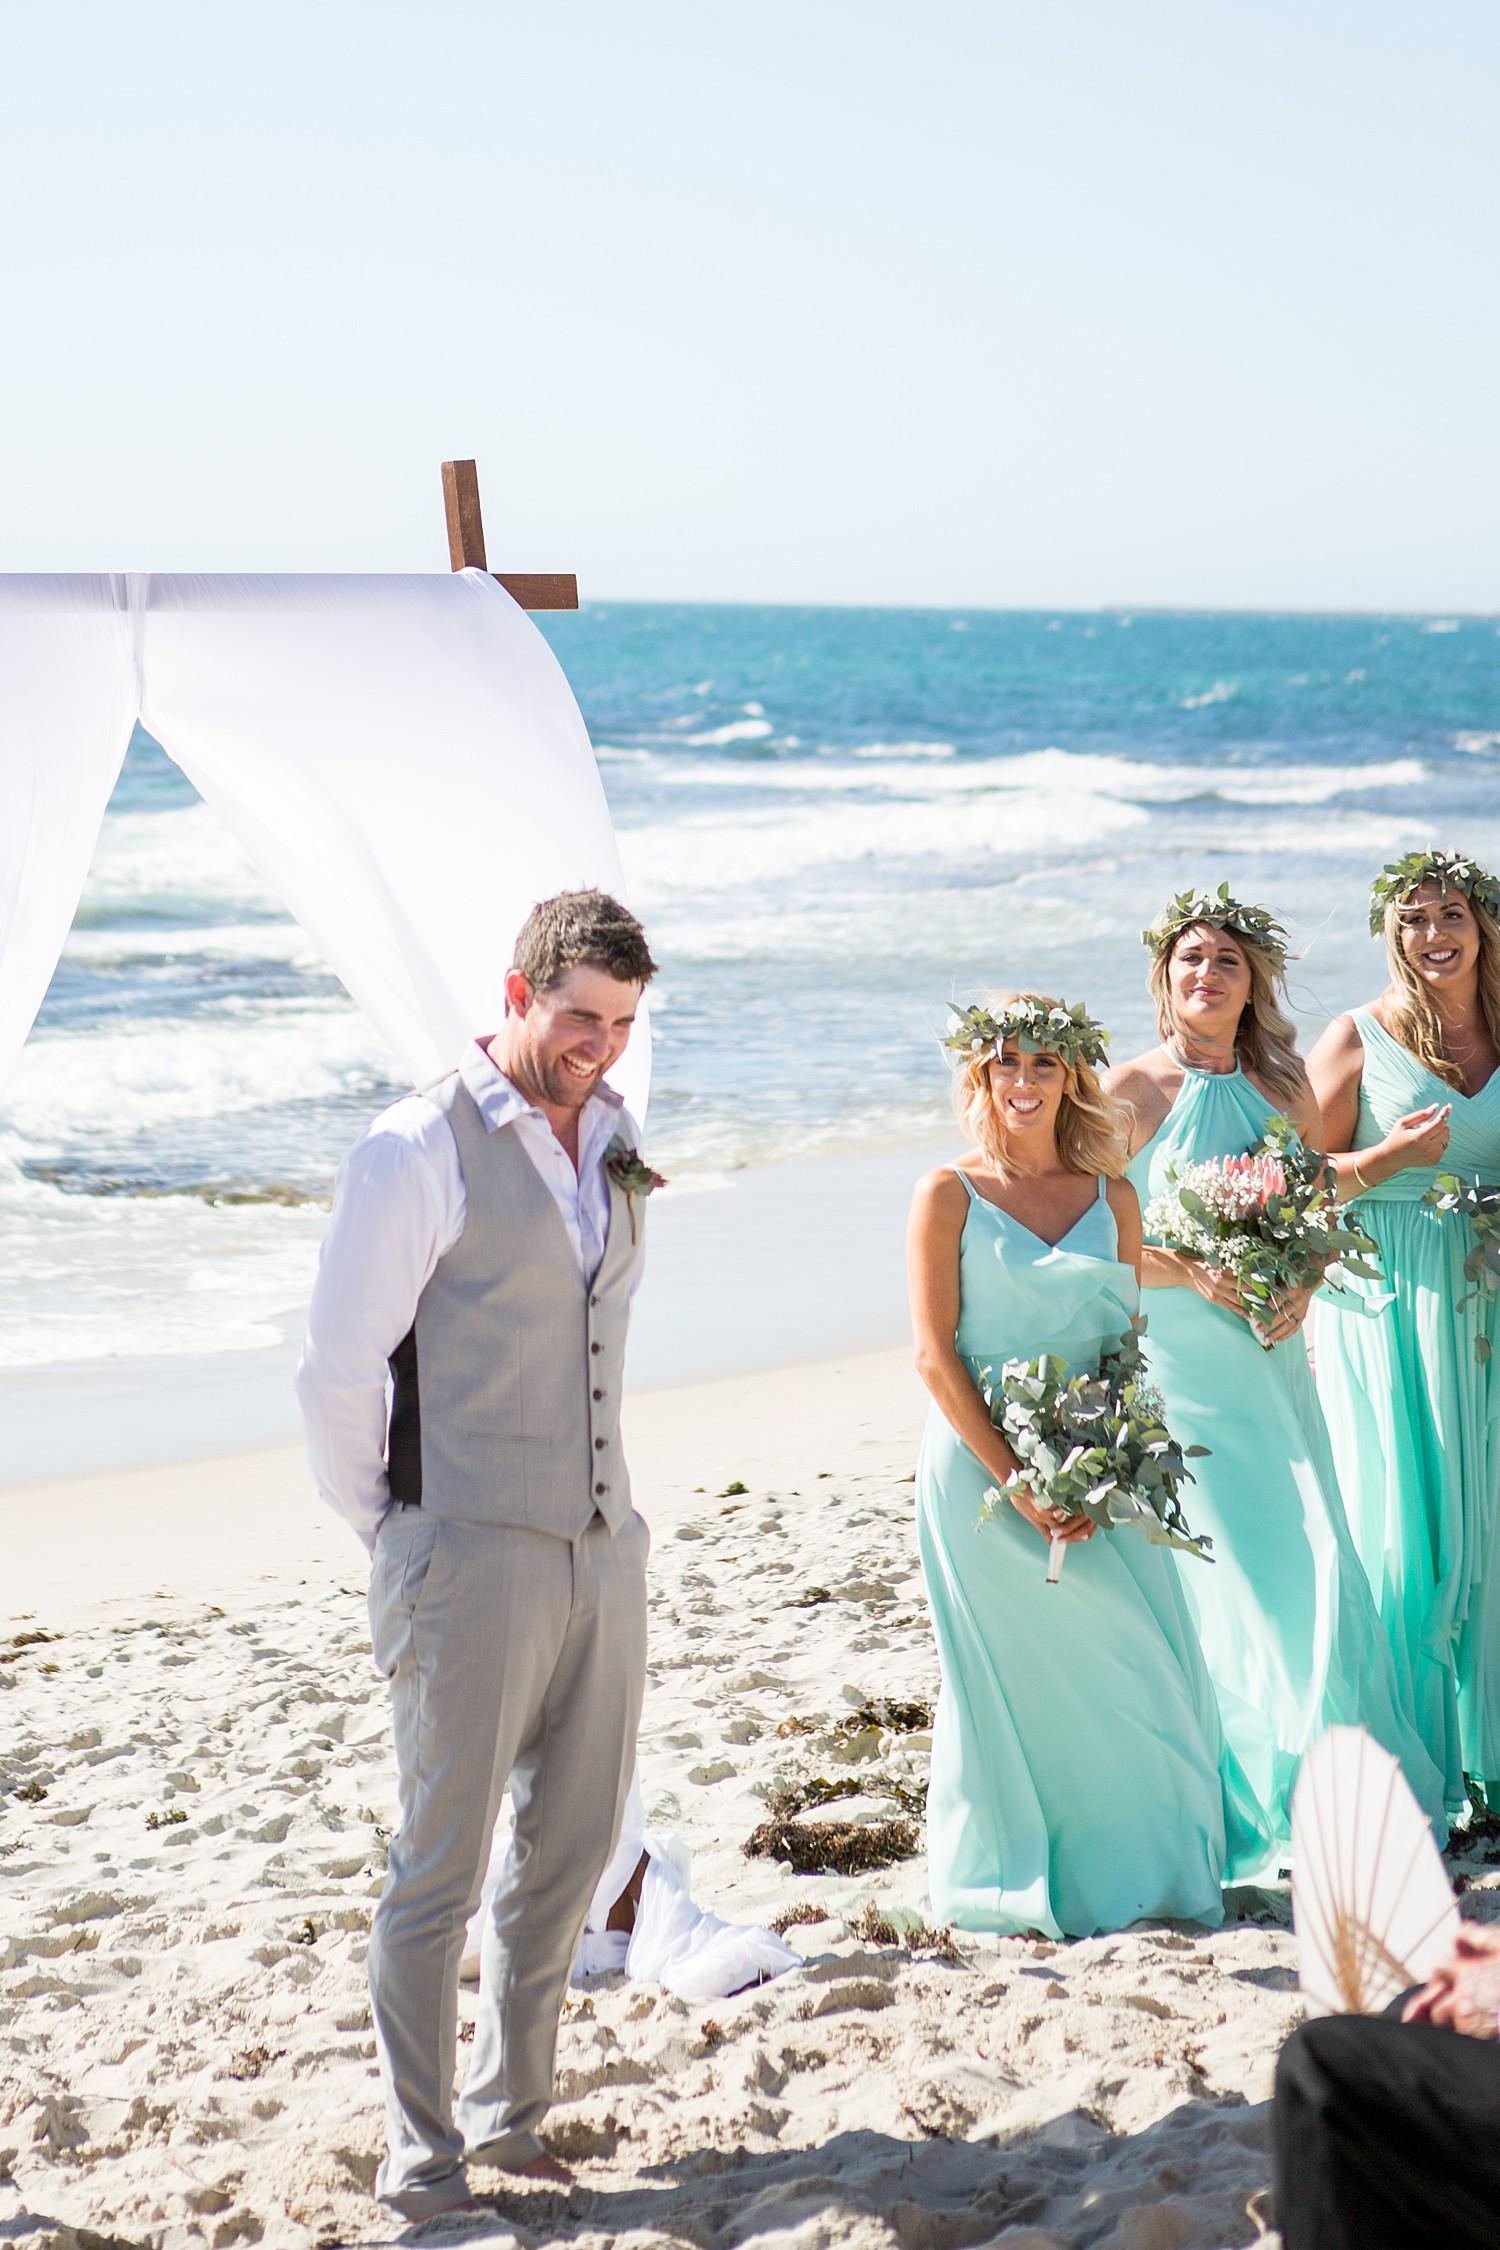 trigg_beach_wedding_perth (27).jpg